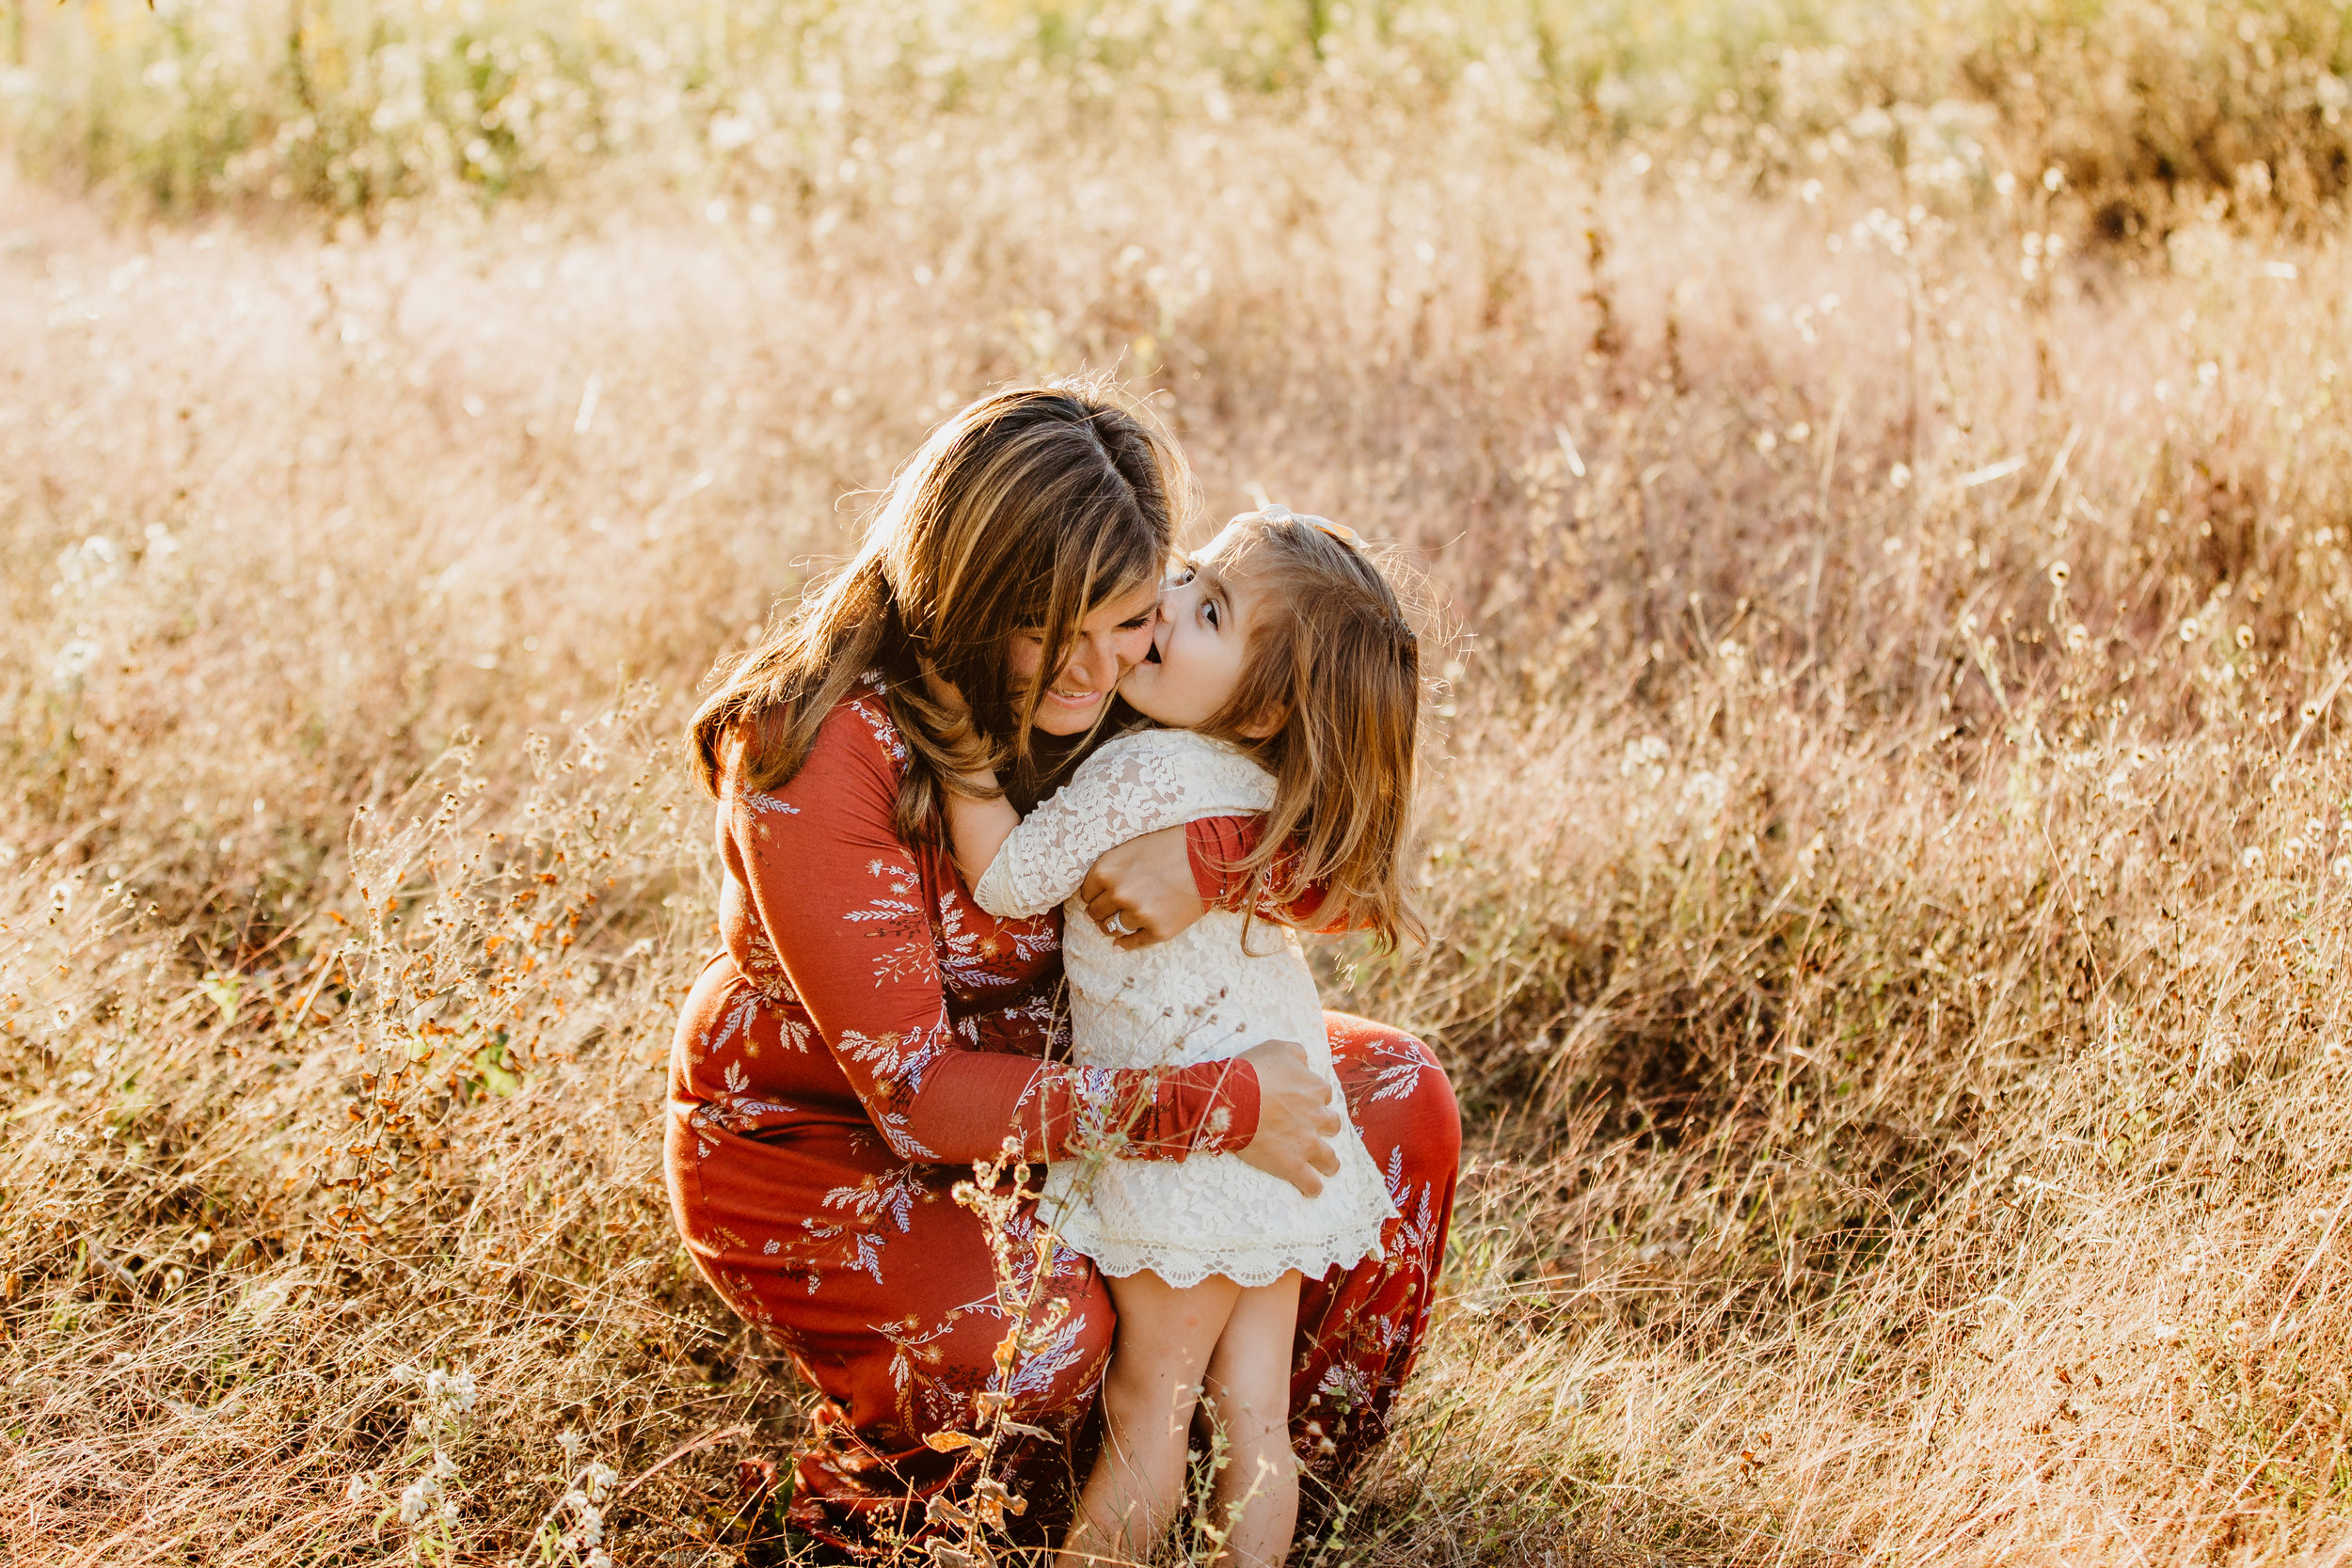 SMP_Diana Hicks_Maternity_Sept 2017-22.jpg